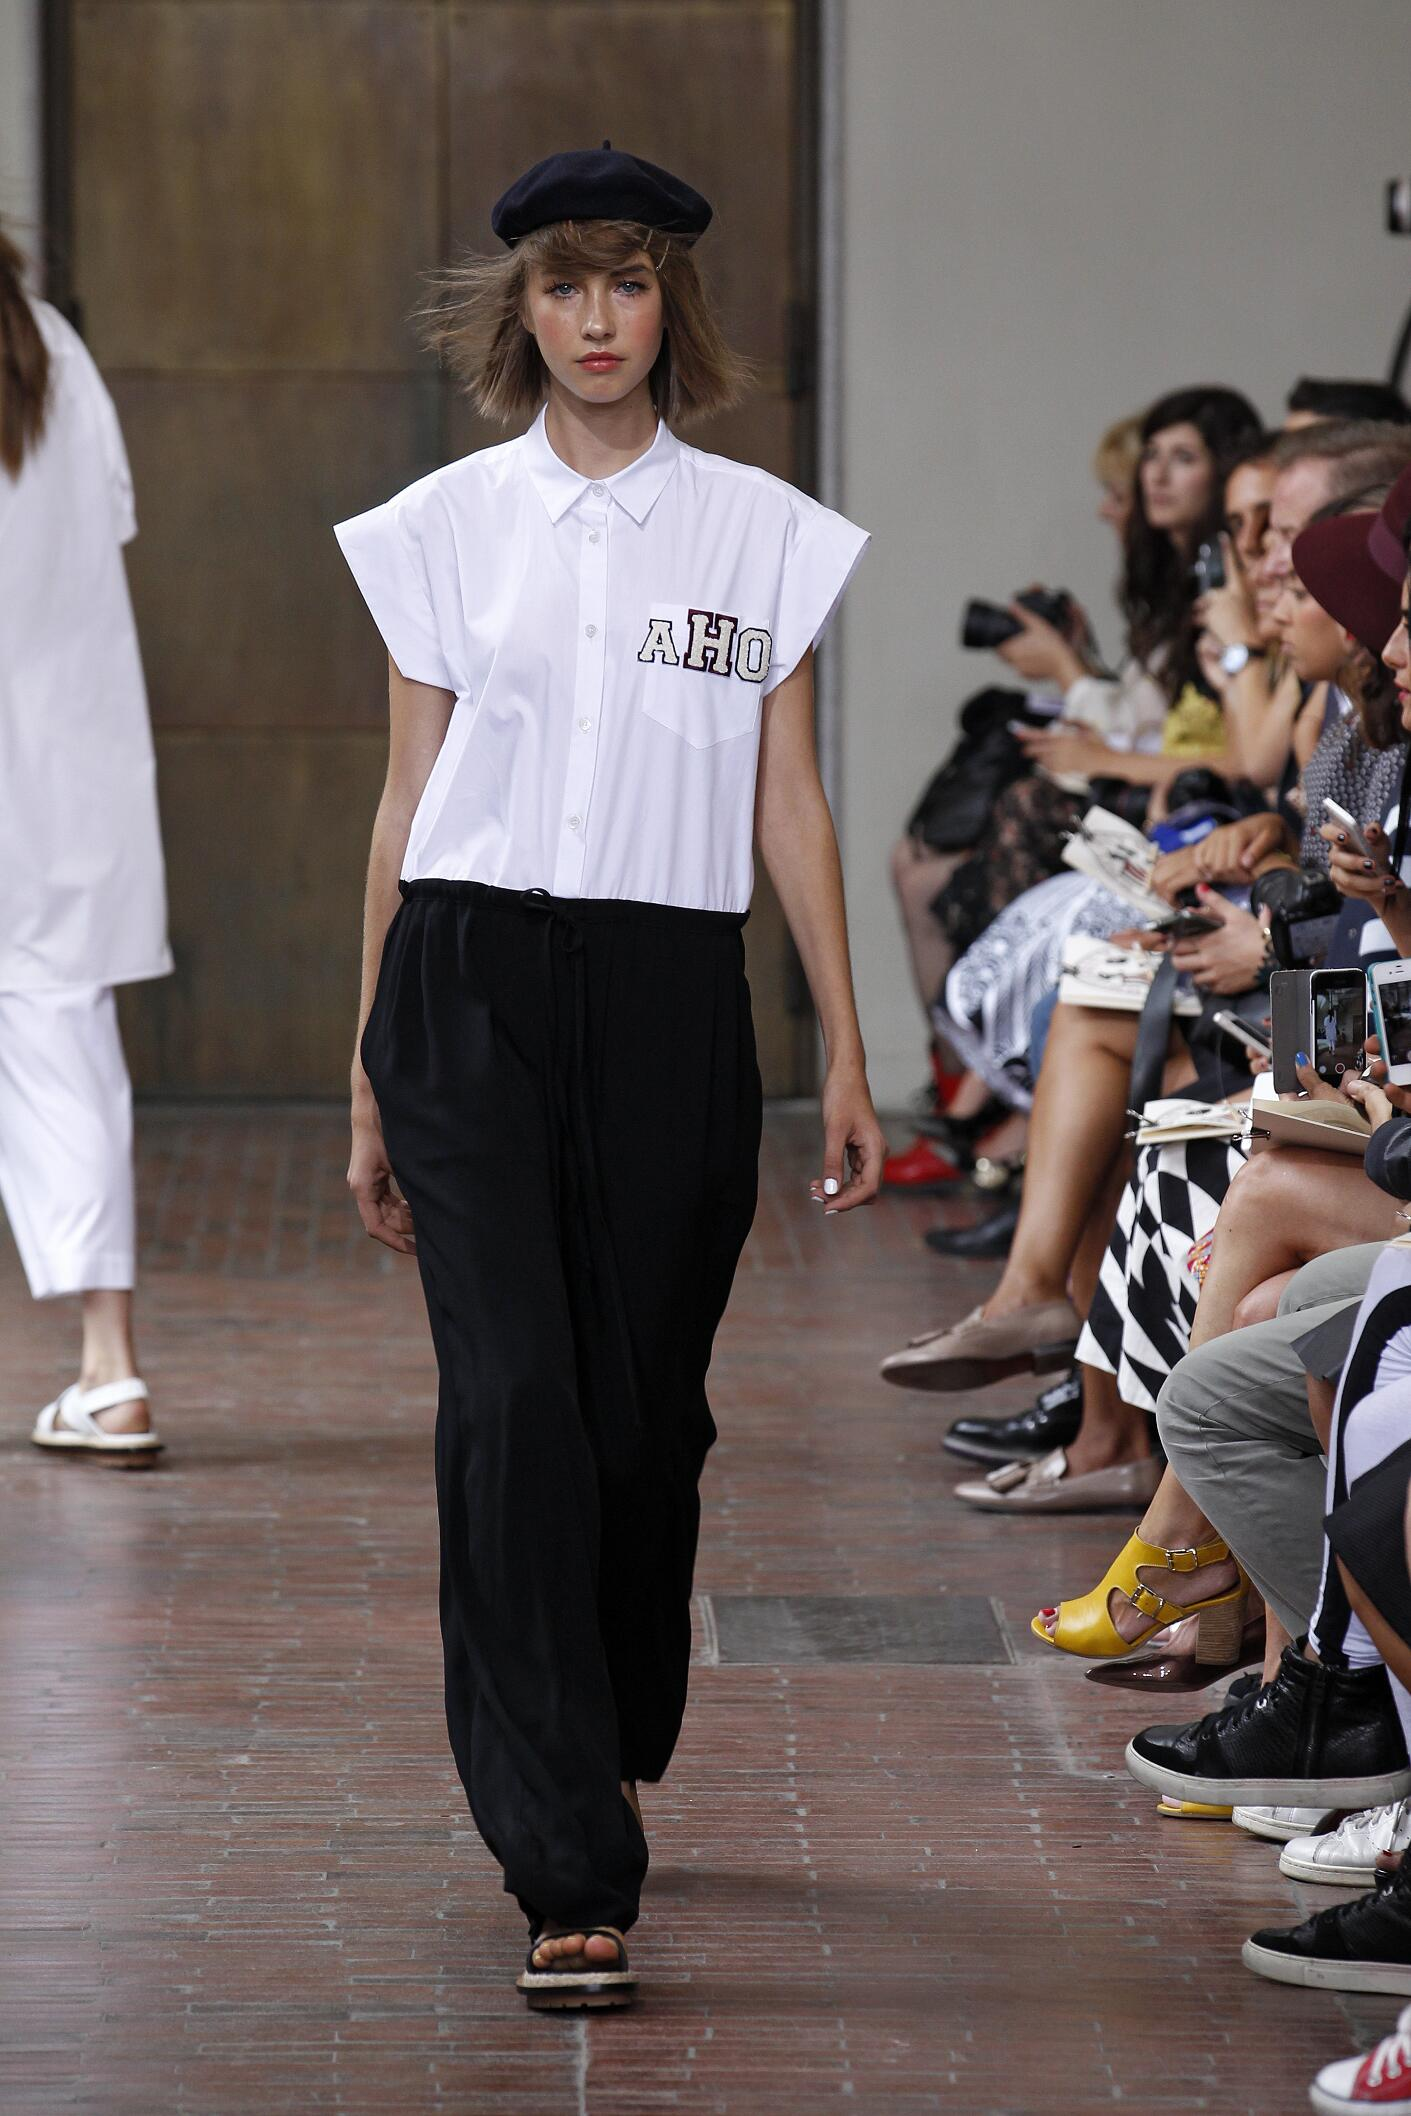 Spring 2015 Woman Fashion Show I'm Isola Marras